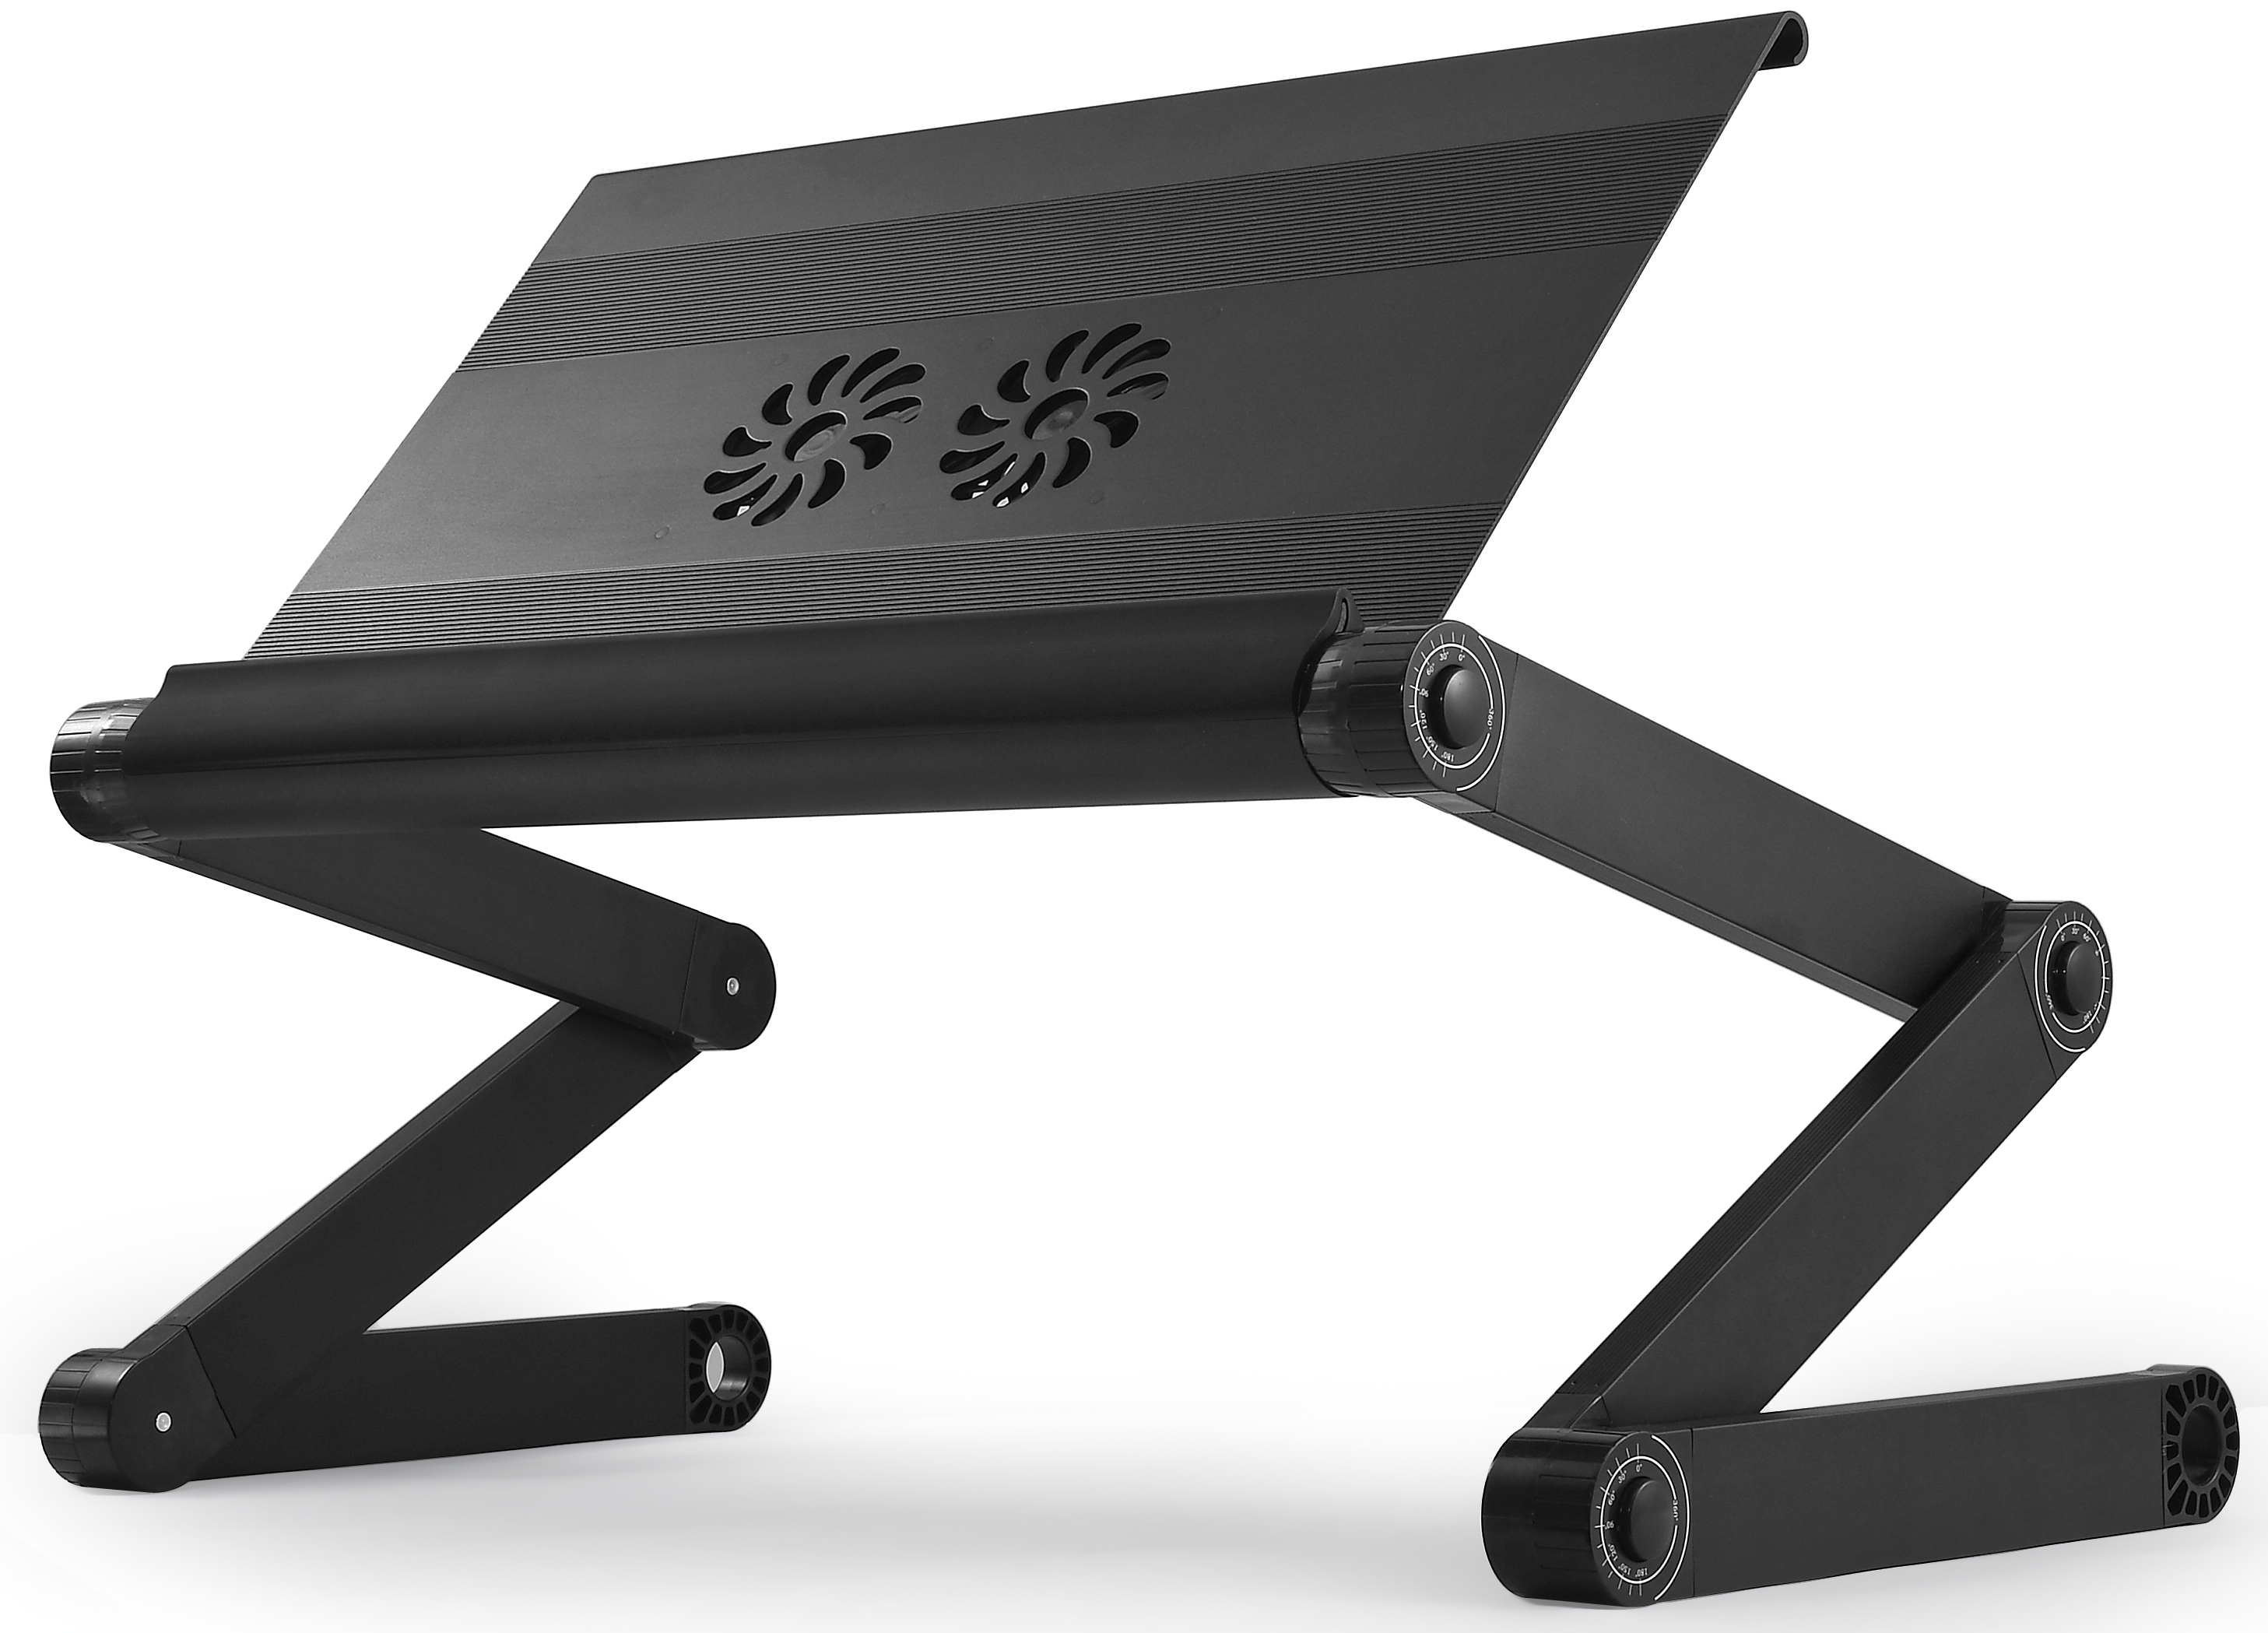 Workez Executive Adjustable Ergonomic Laptop Cooling Stand